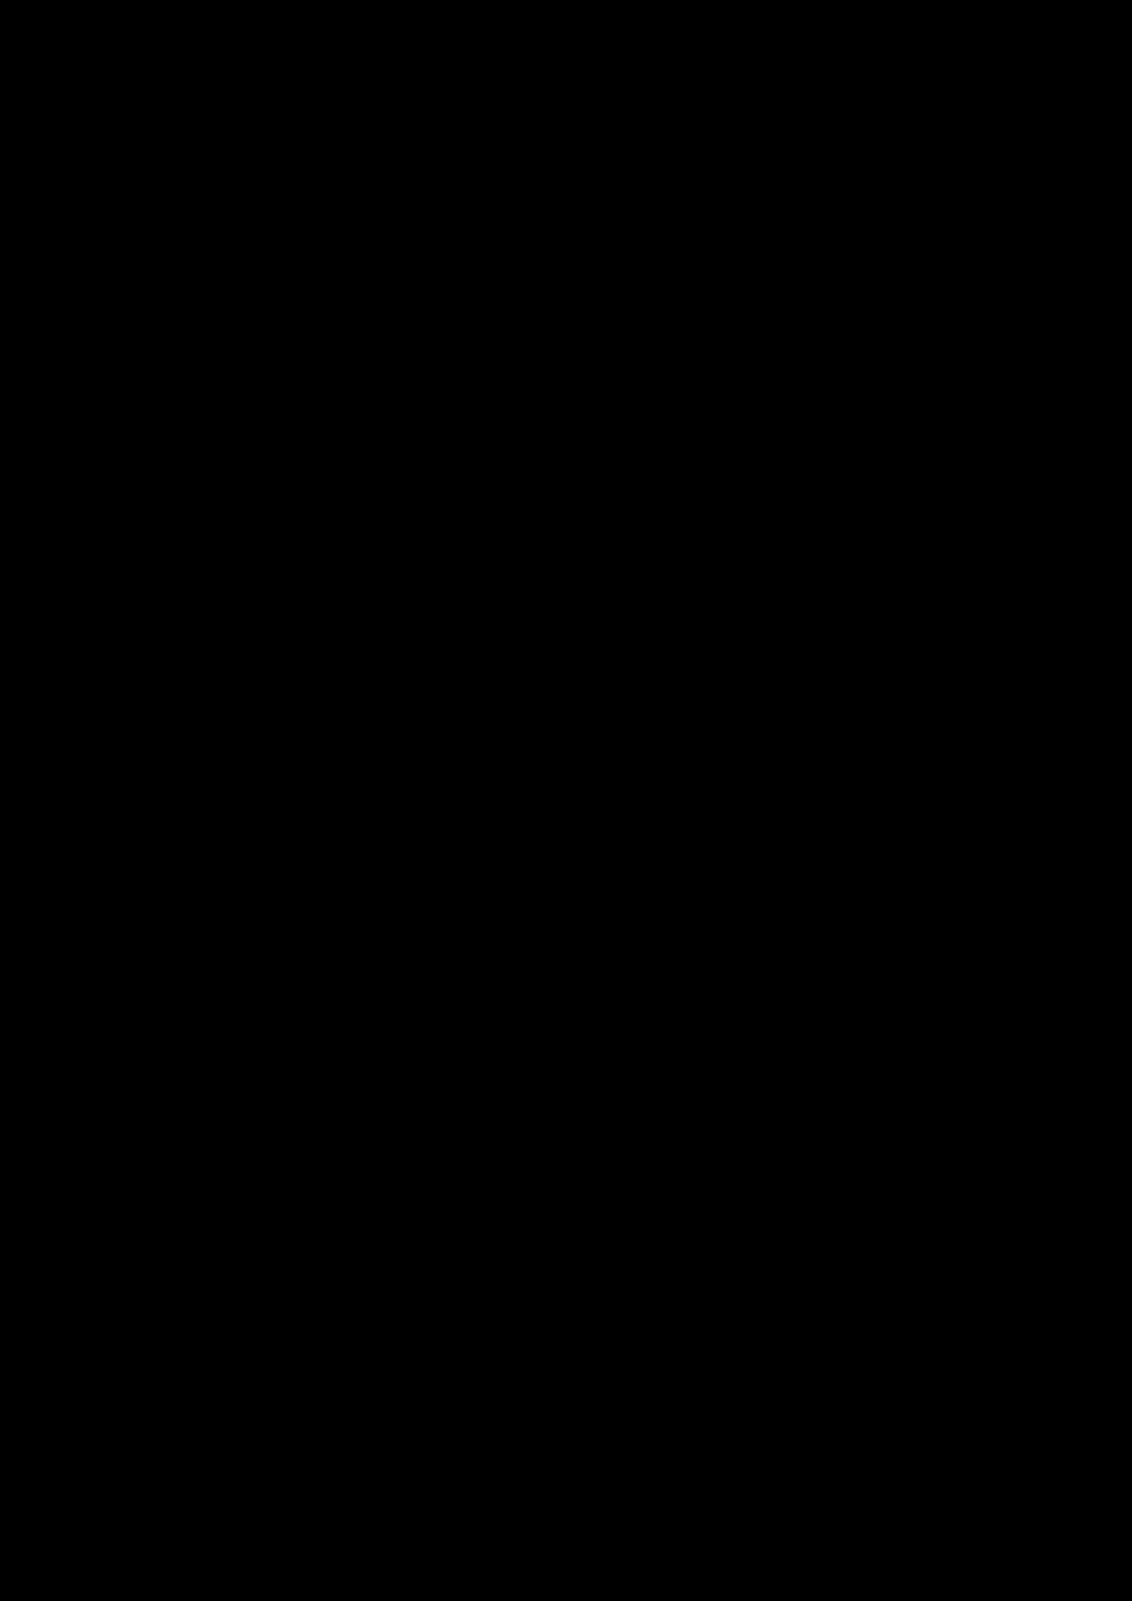 Belyiy sokol slide, Image 149